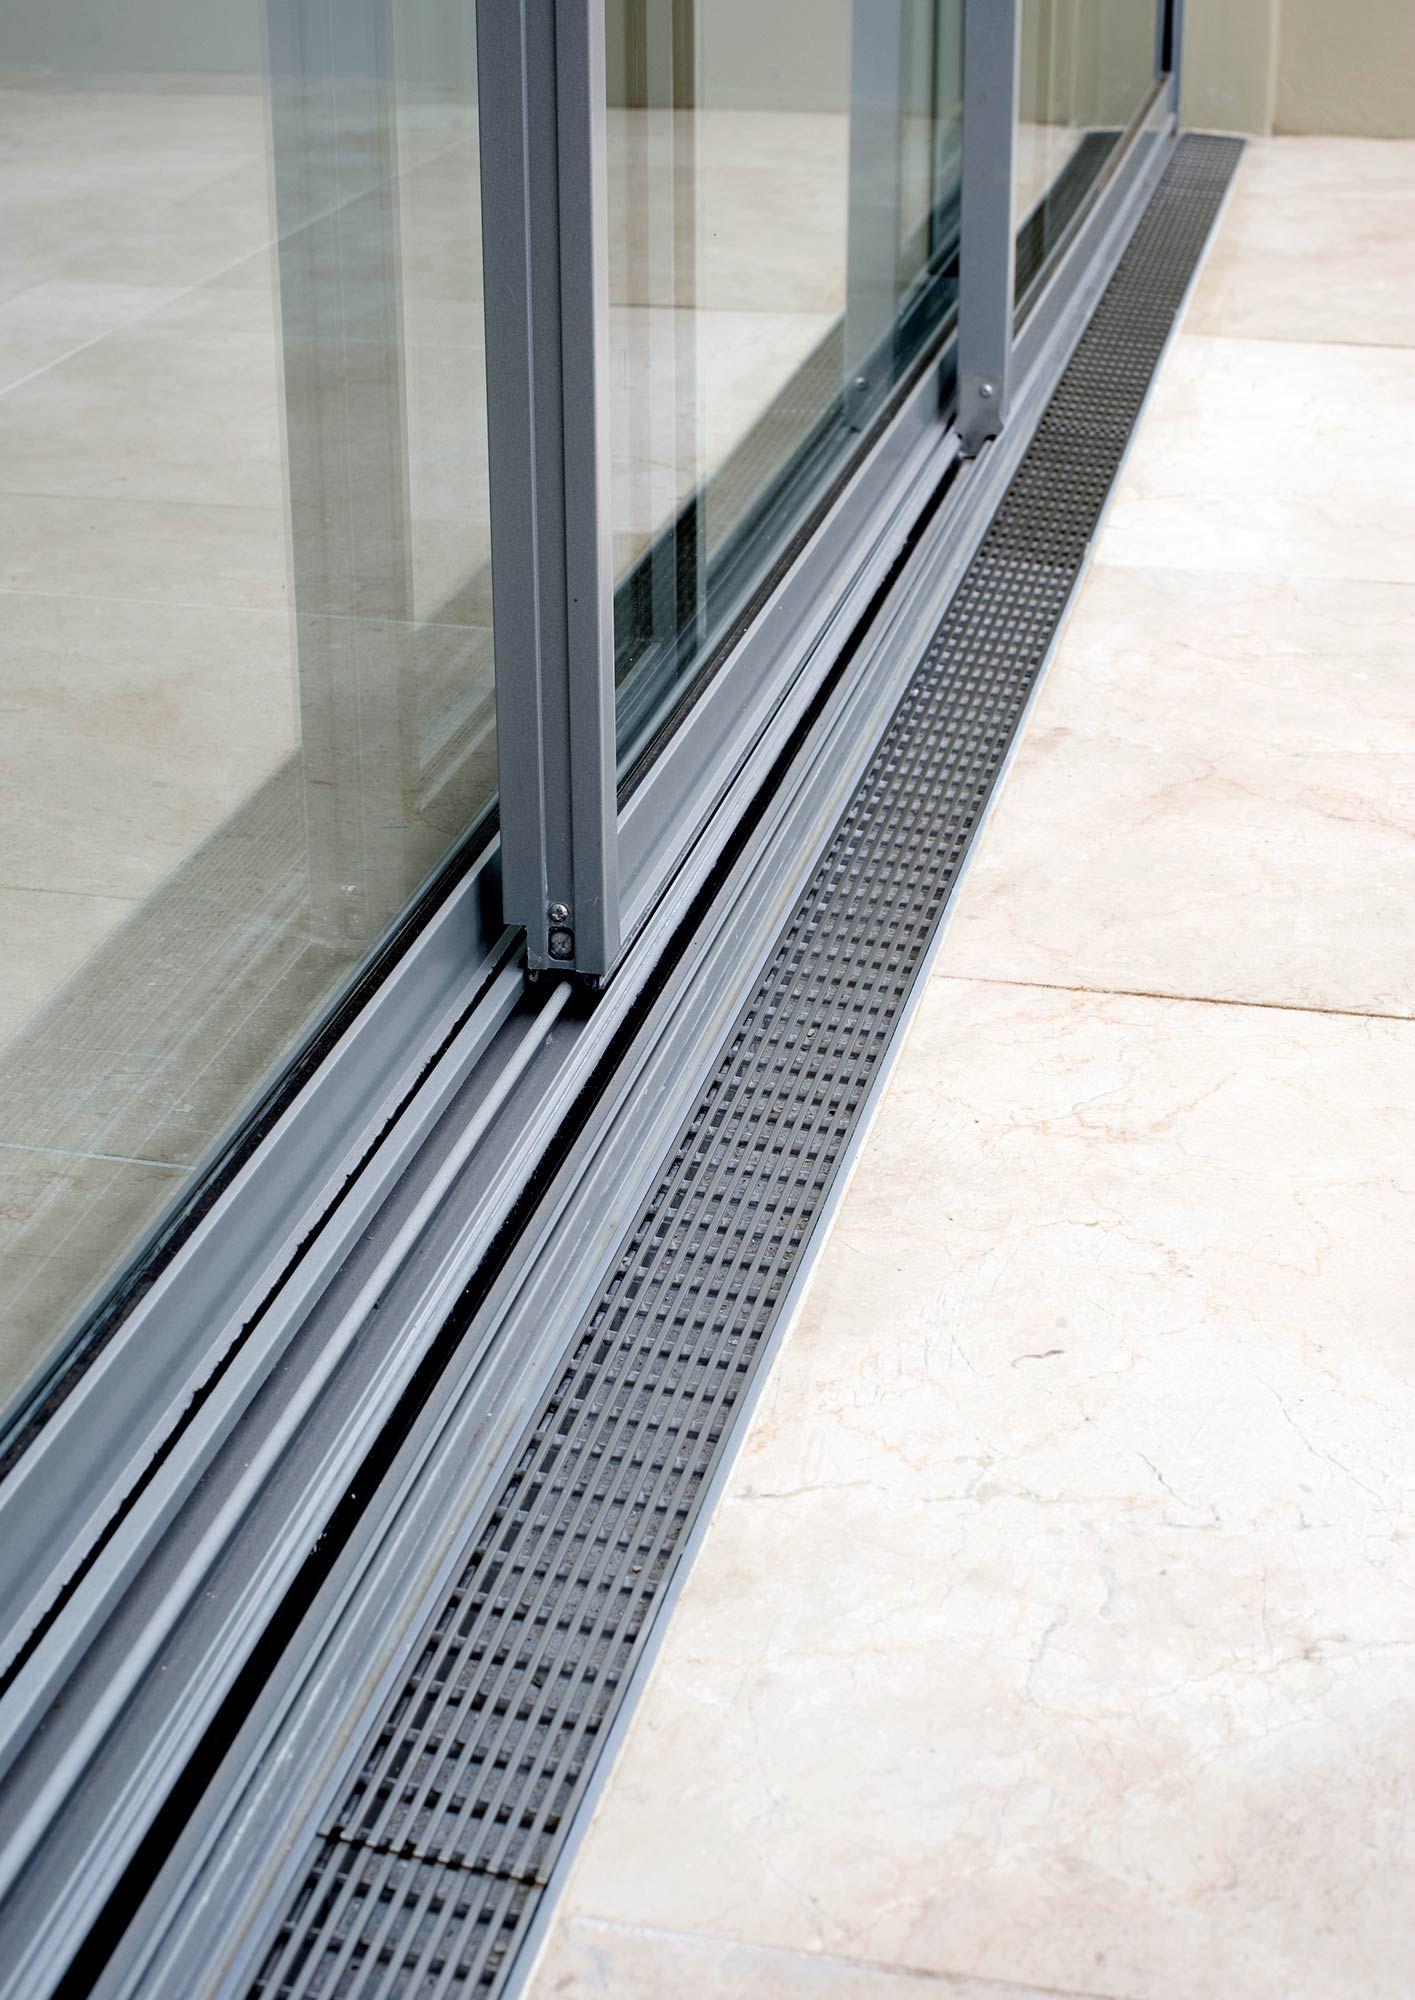 Outdoor Drains Door Design House Design Concrete House